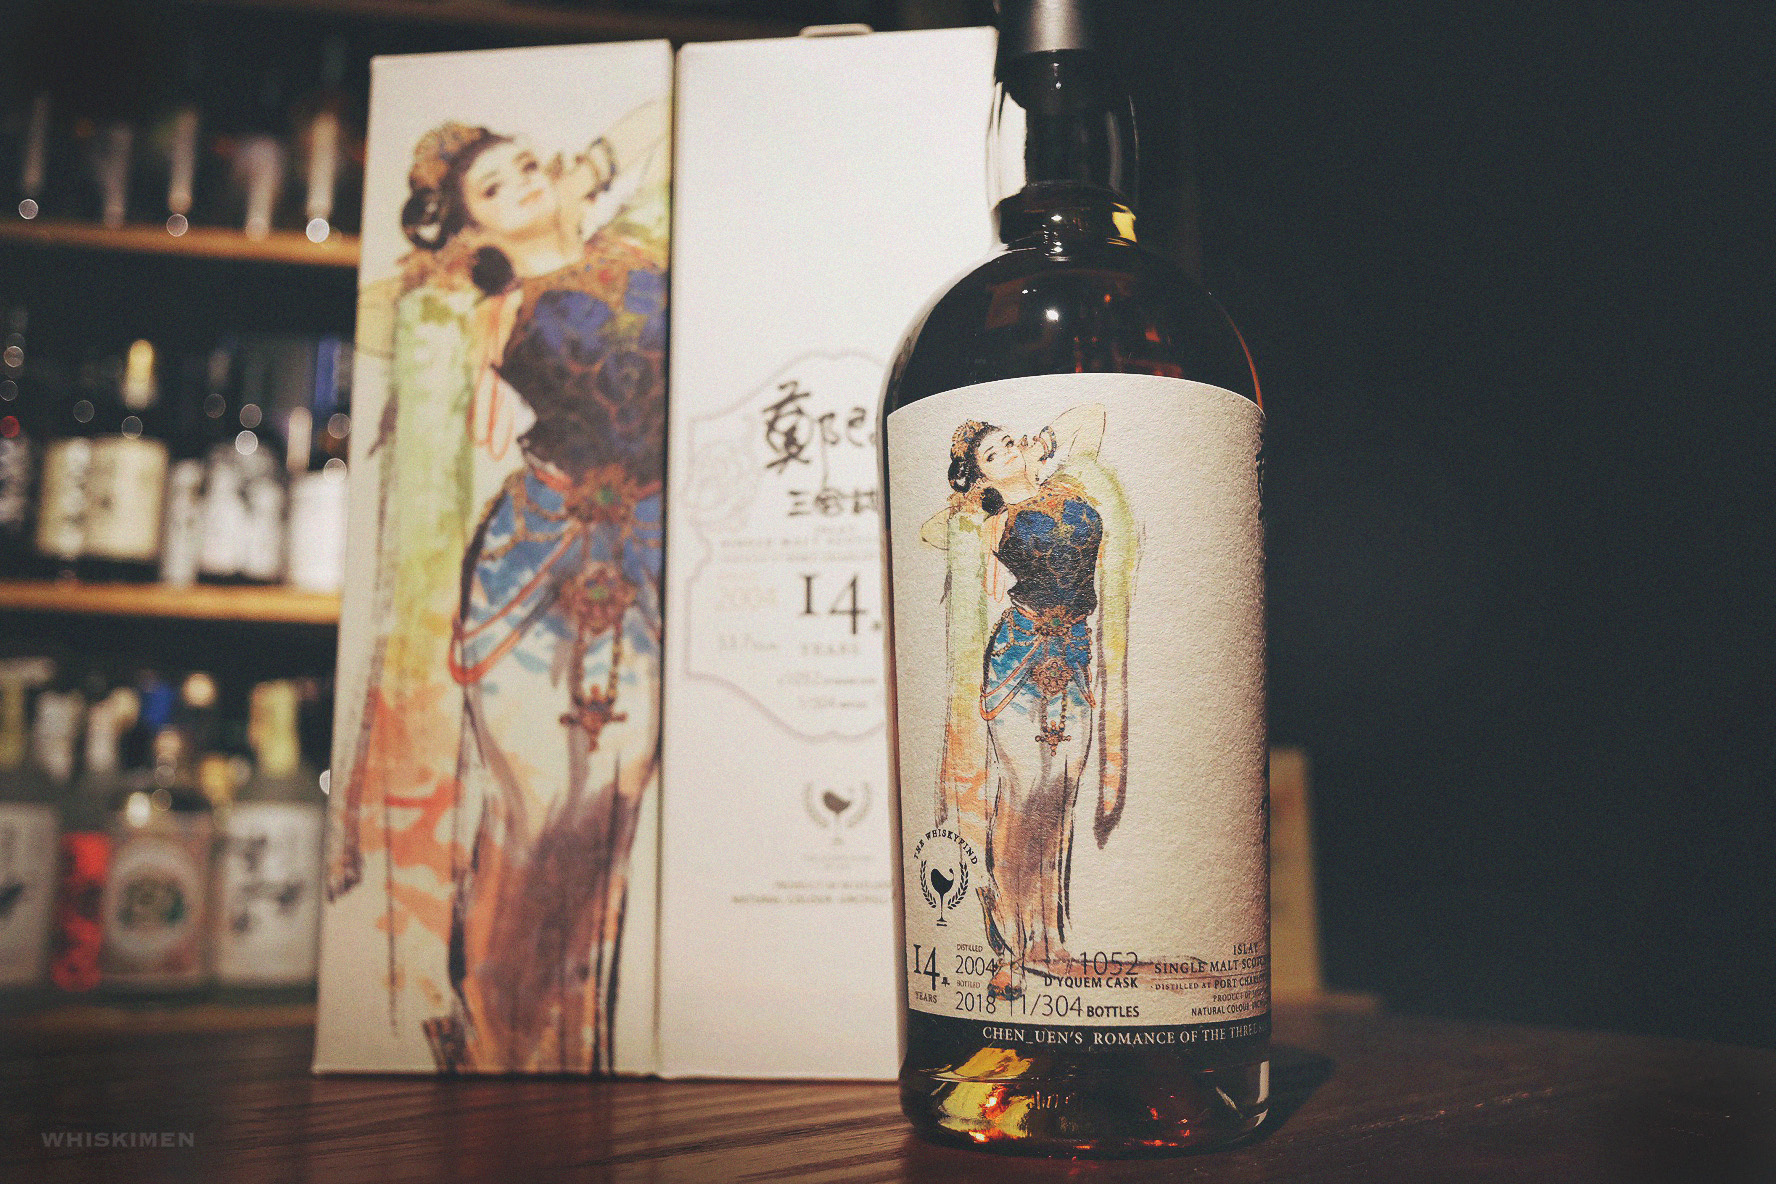 The Whiskyfind《鄭問三國誌系列》 Port Charlotte 2004 14YO Single Malt Whisky (貂蟬)